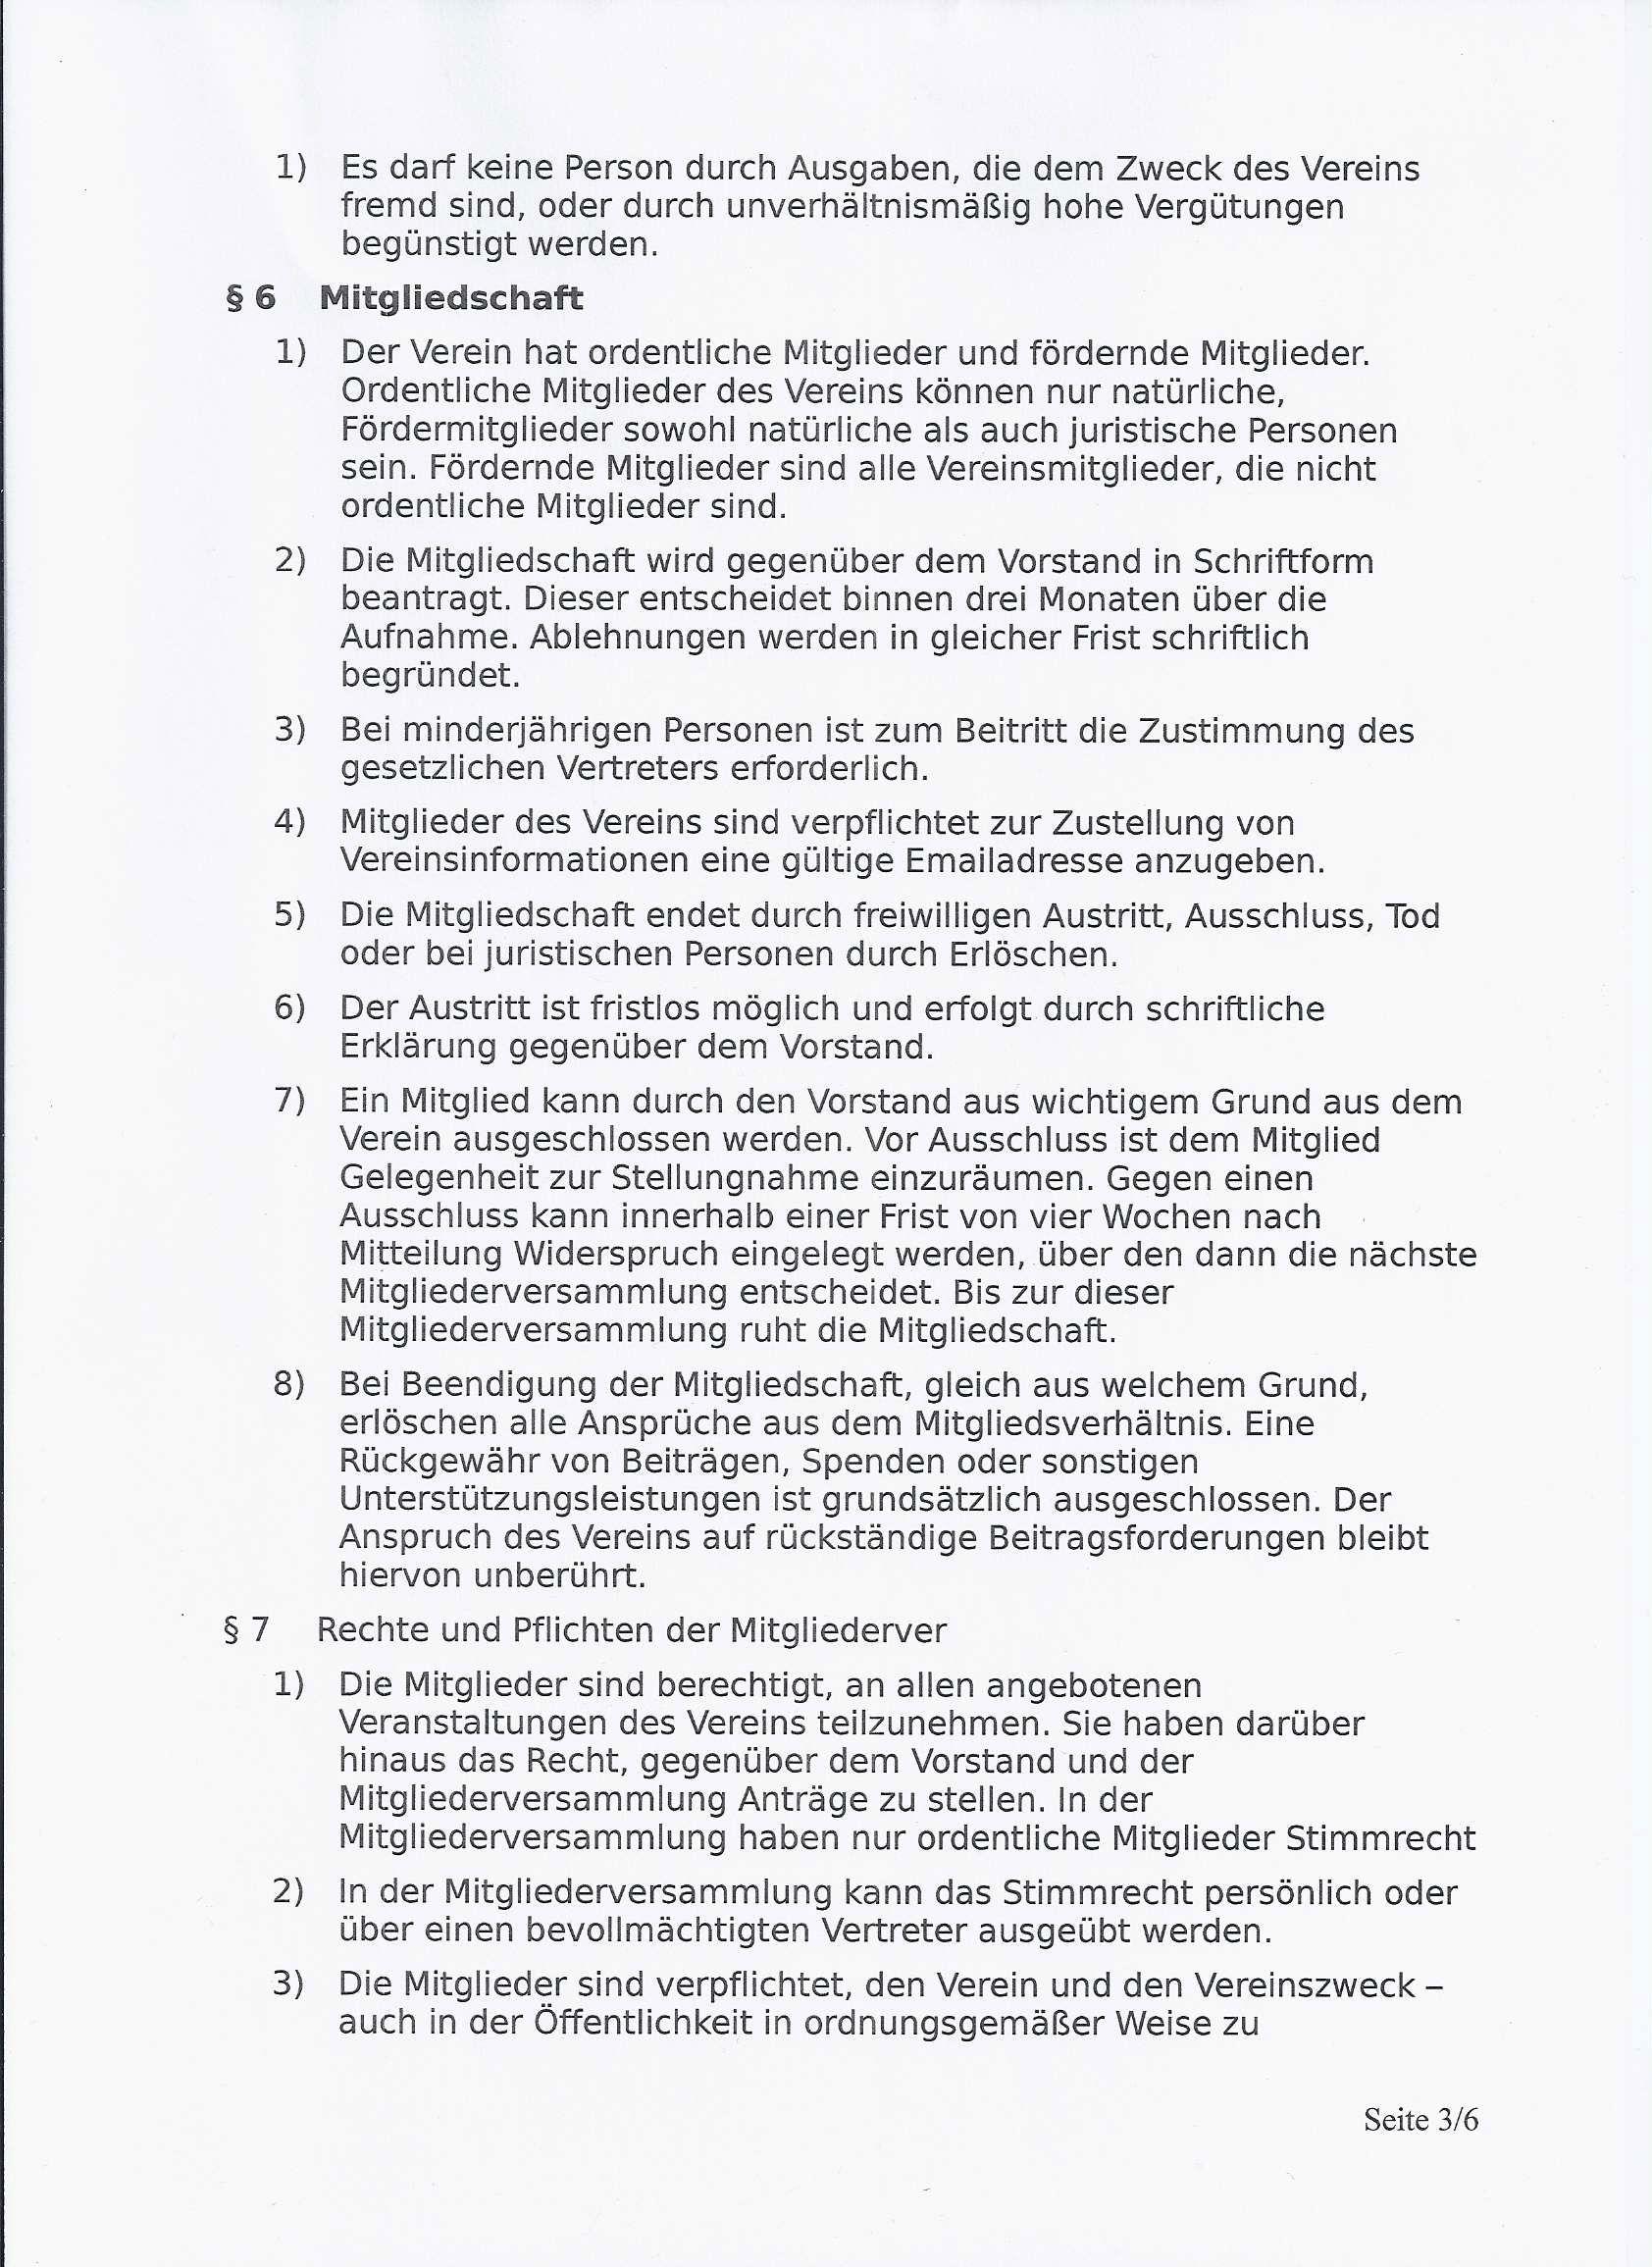 Satzung/Gründungssatzung/verein_freifunk_oldenburg_satzung_0003.jpg